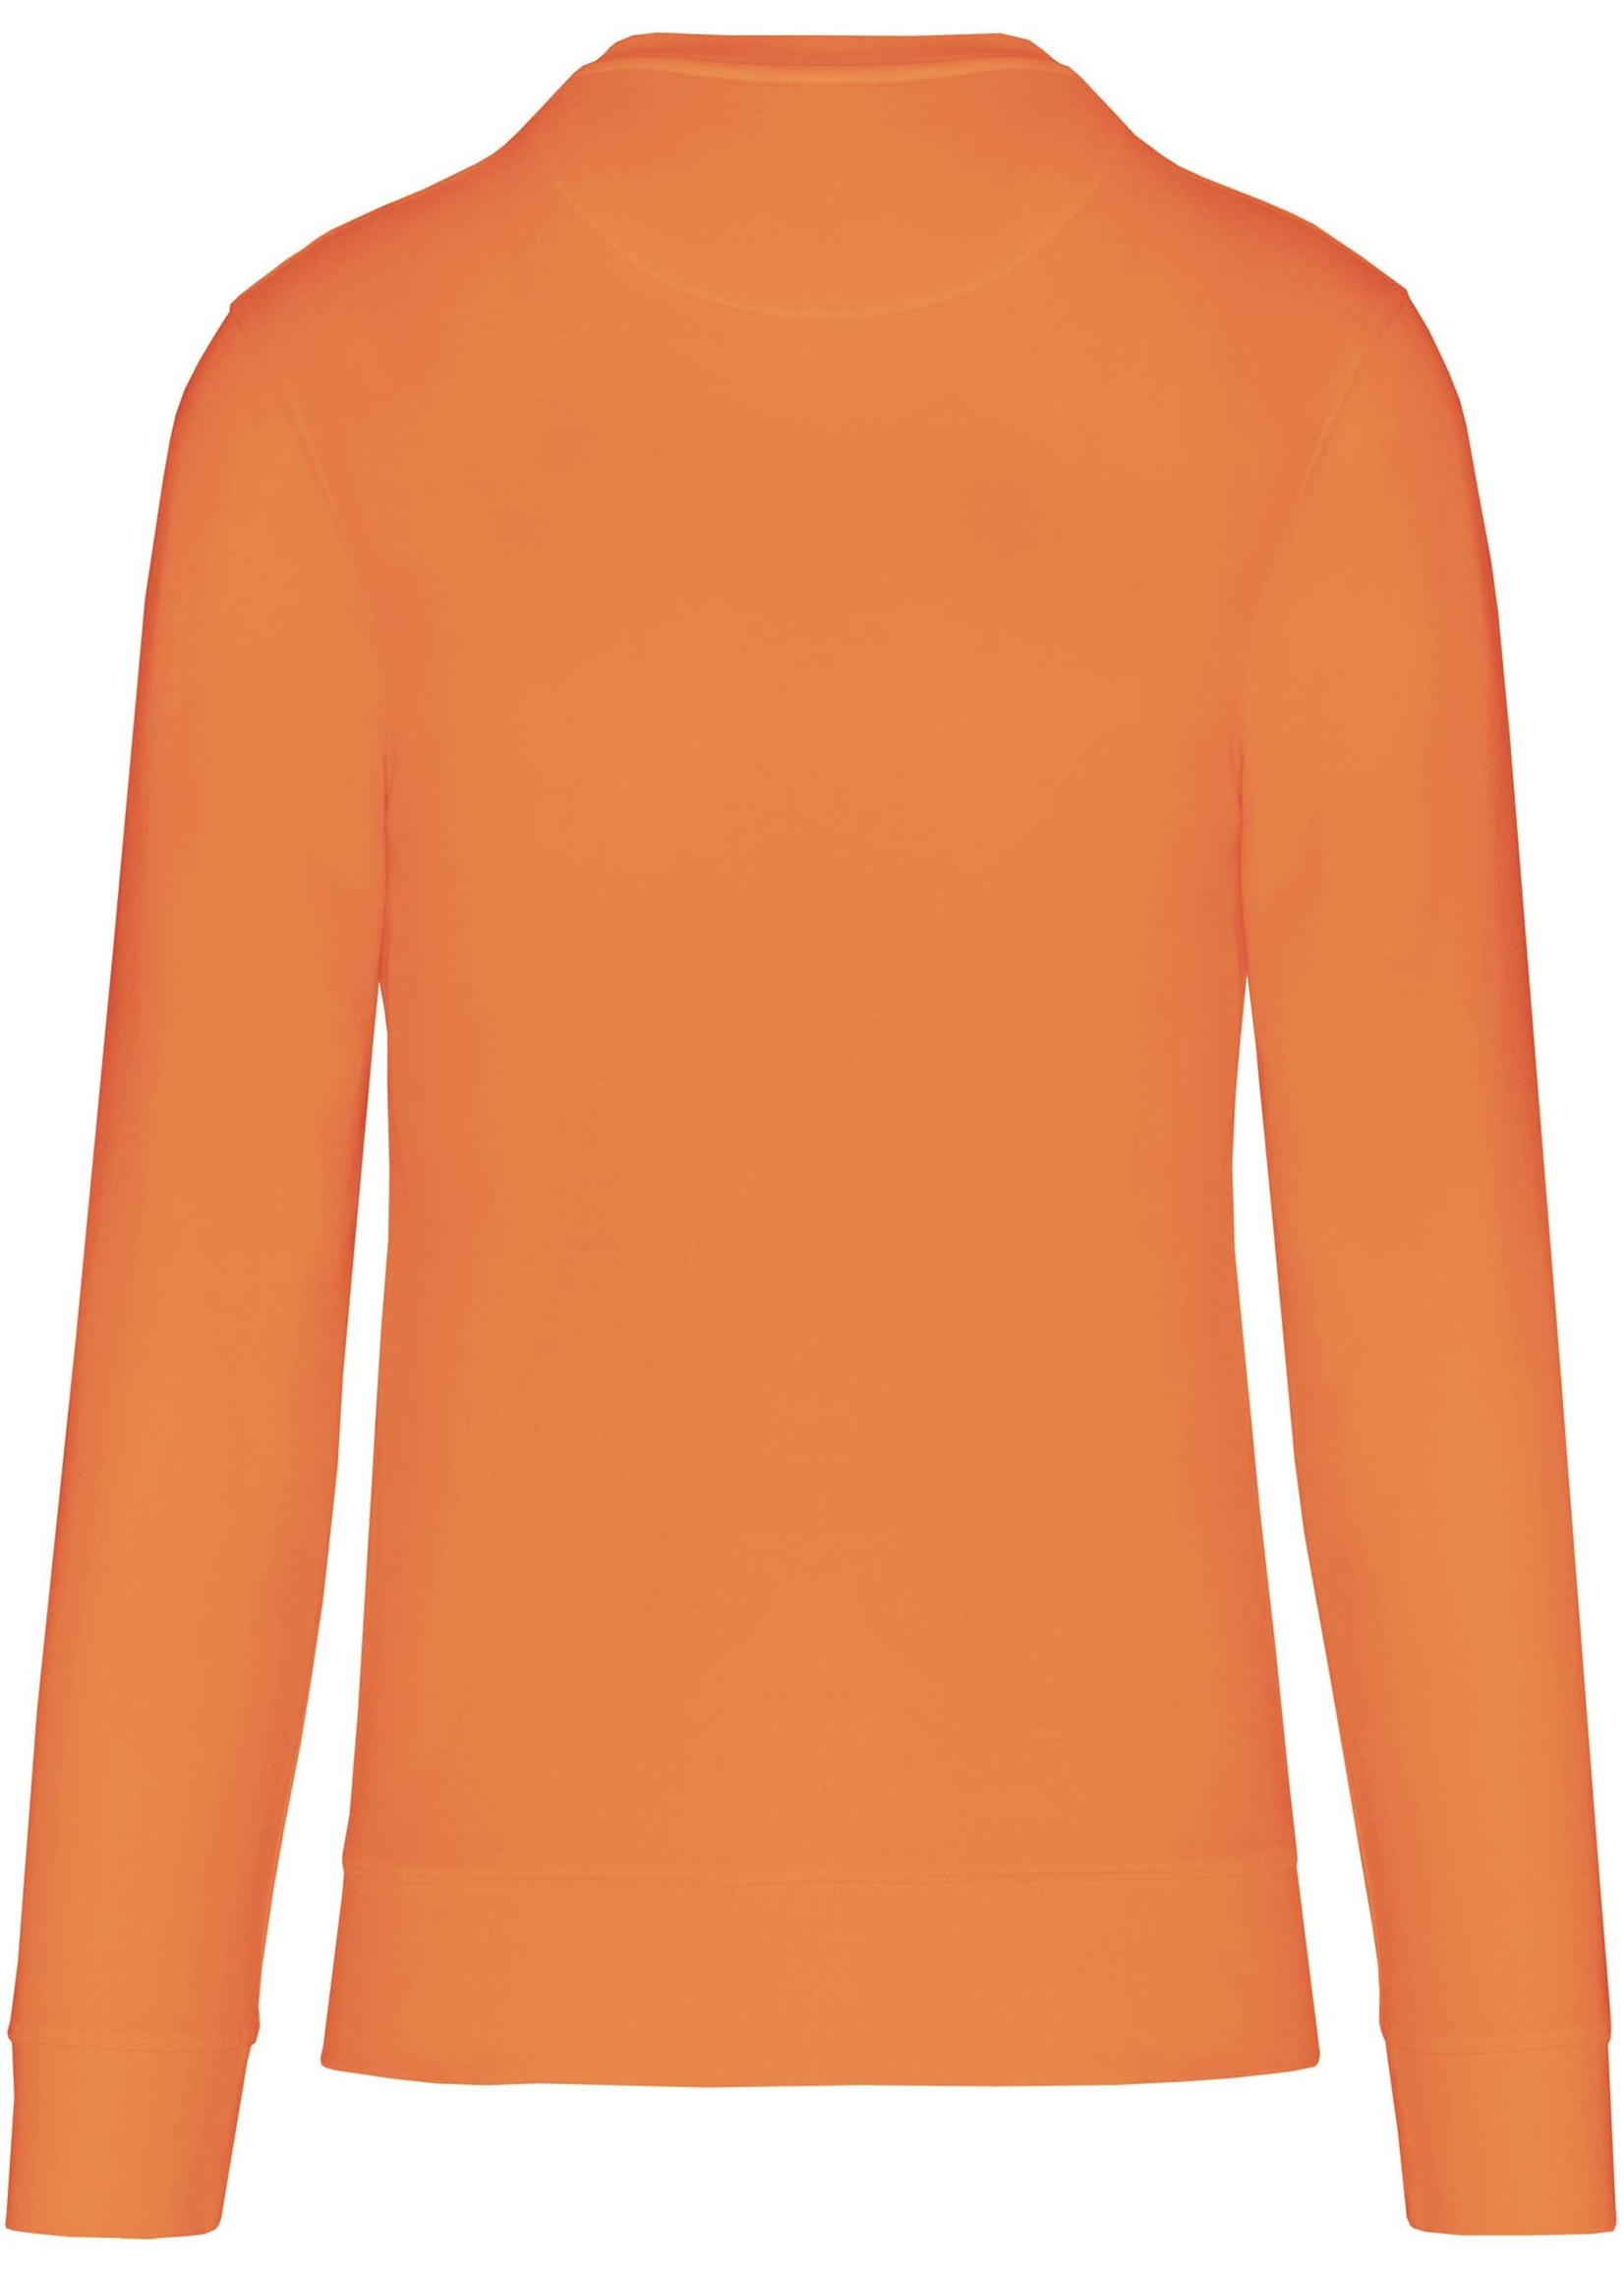 Eco-Friendly Crew Neck Sweater Kids-Light Orange